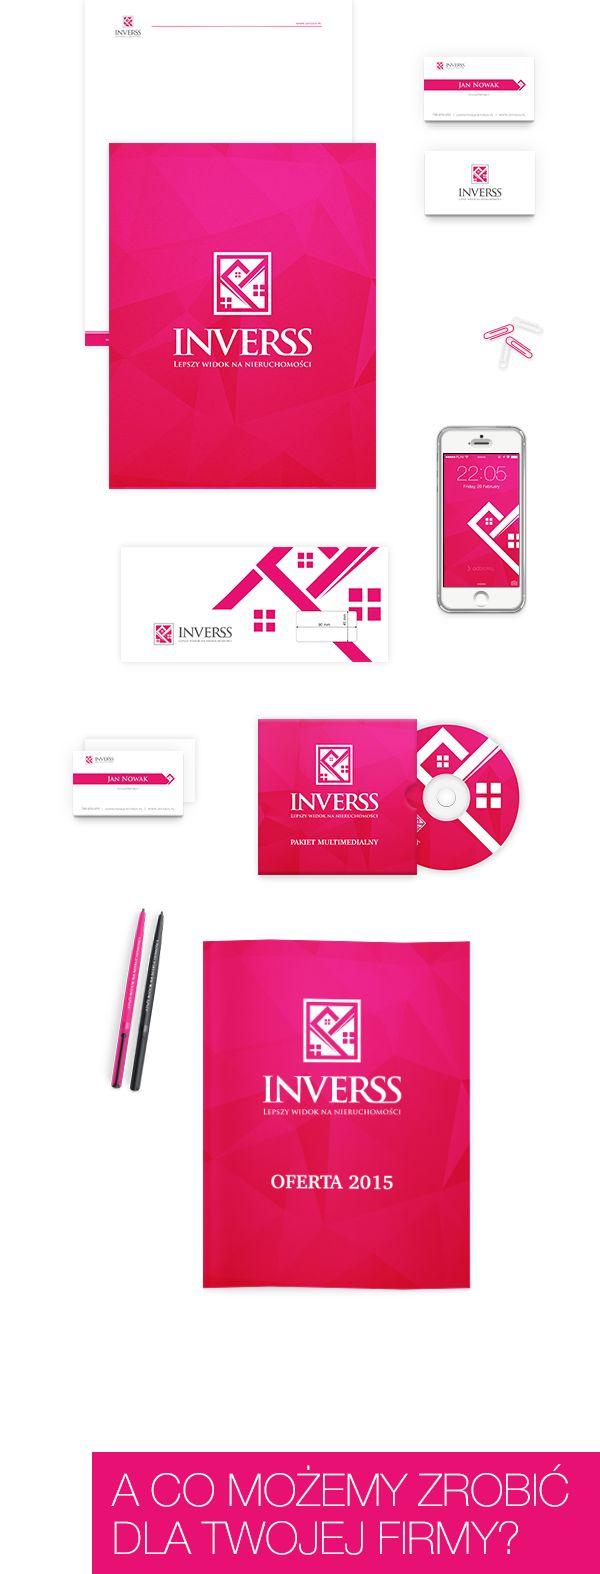 Inverss //   #branding #corporateidentity #visualidentification